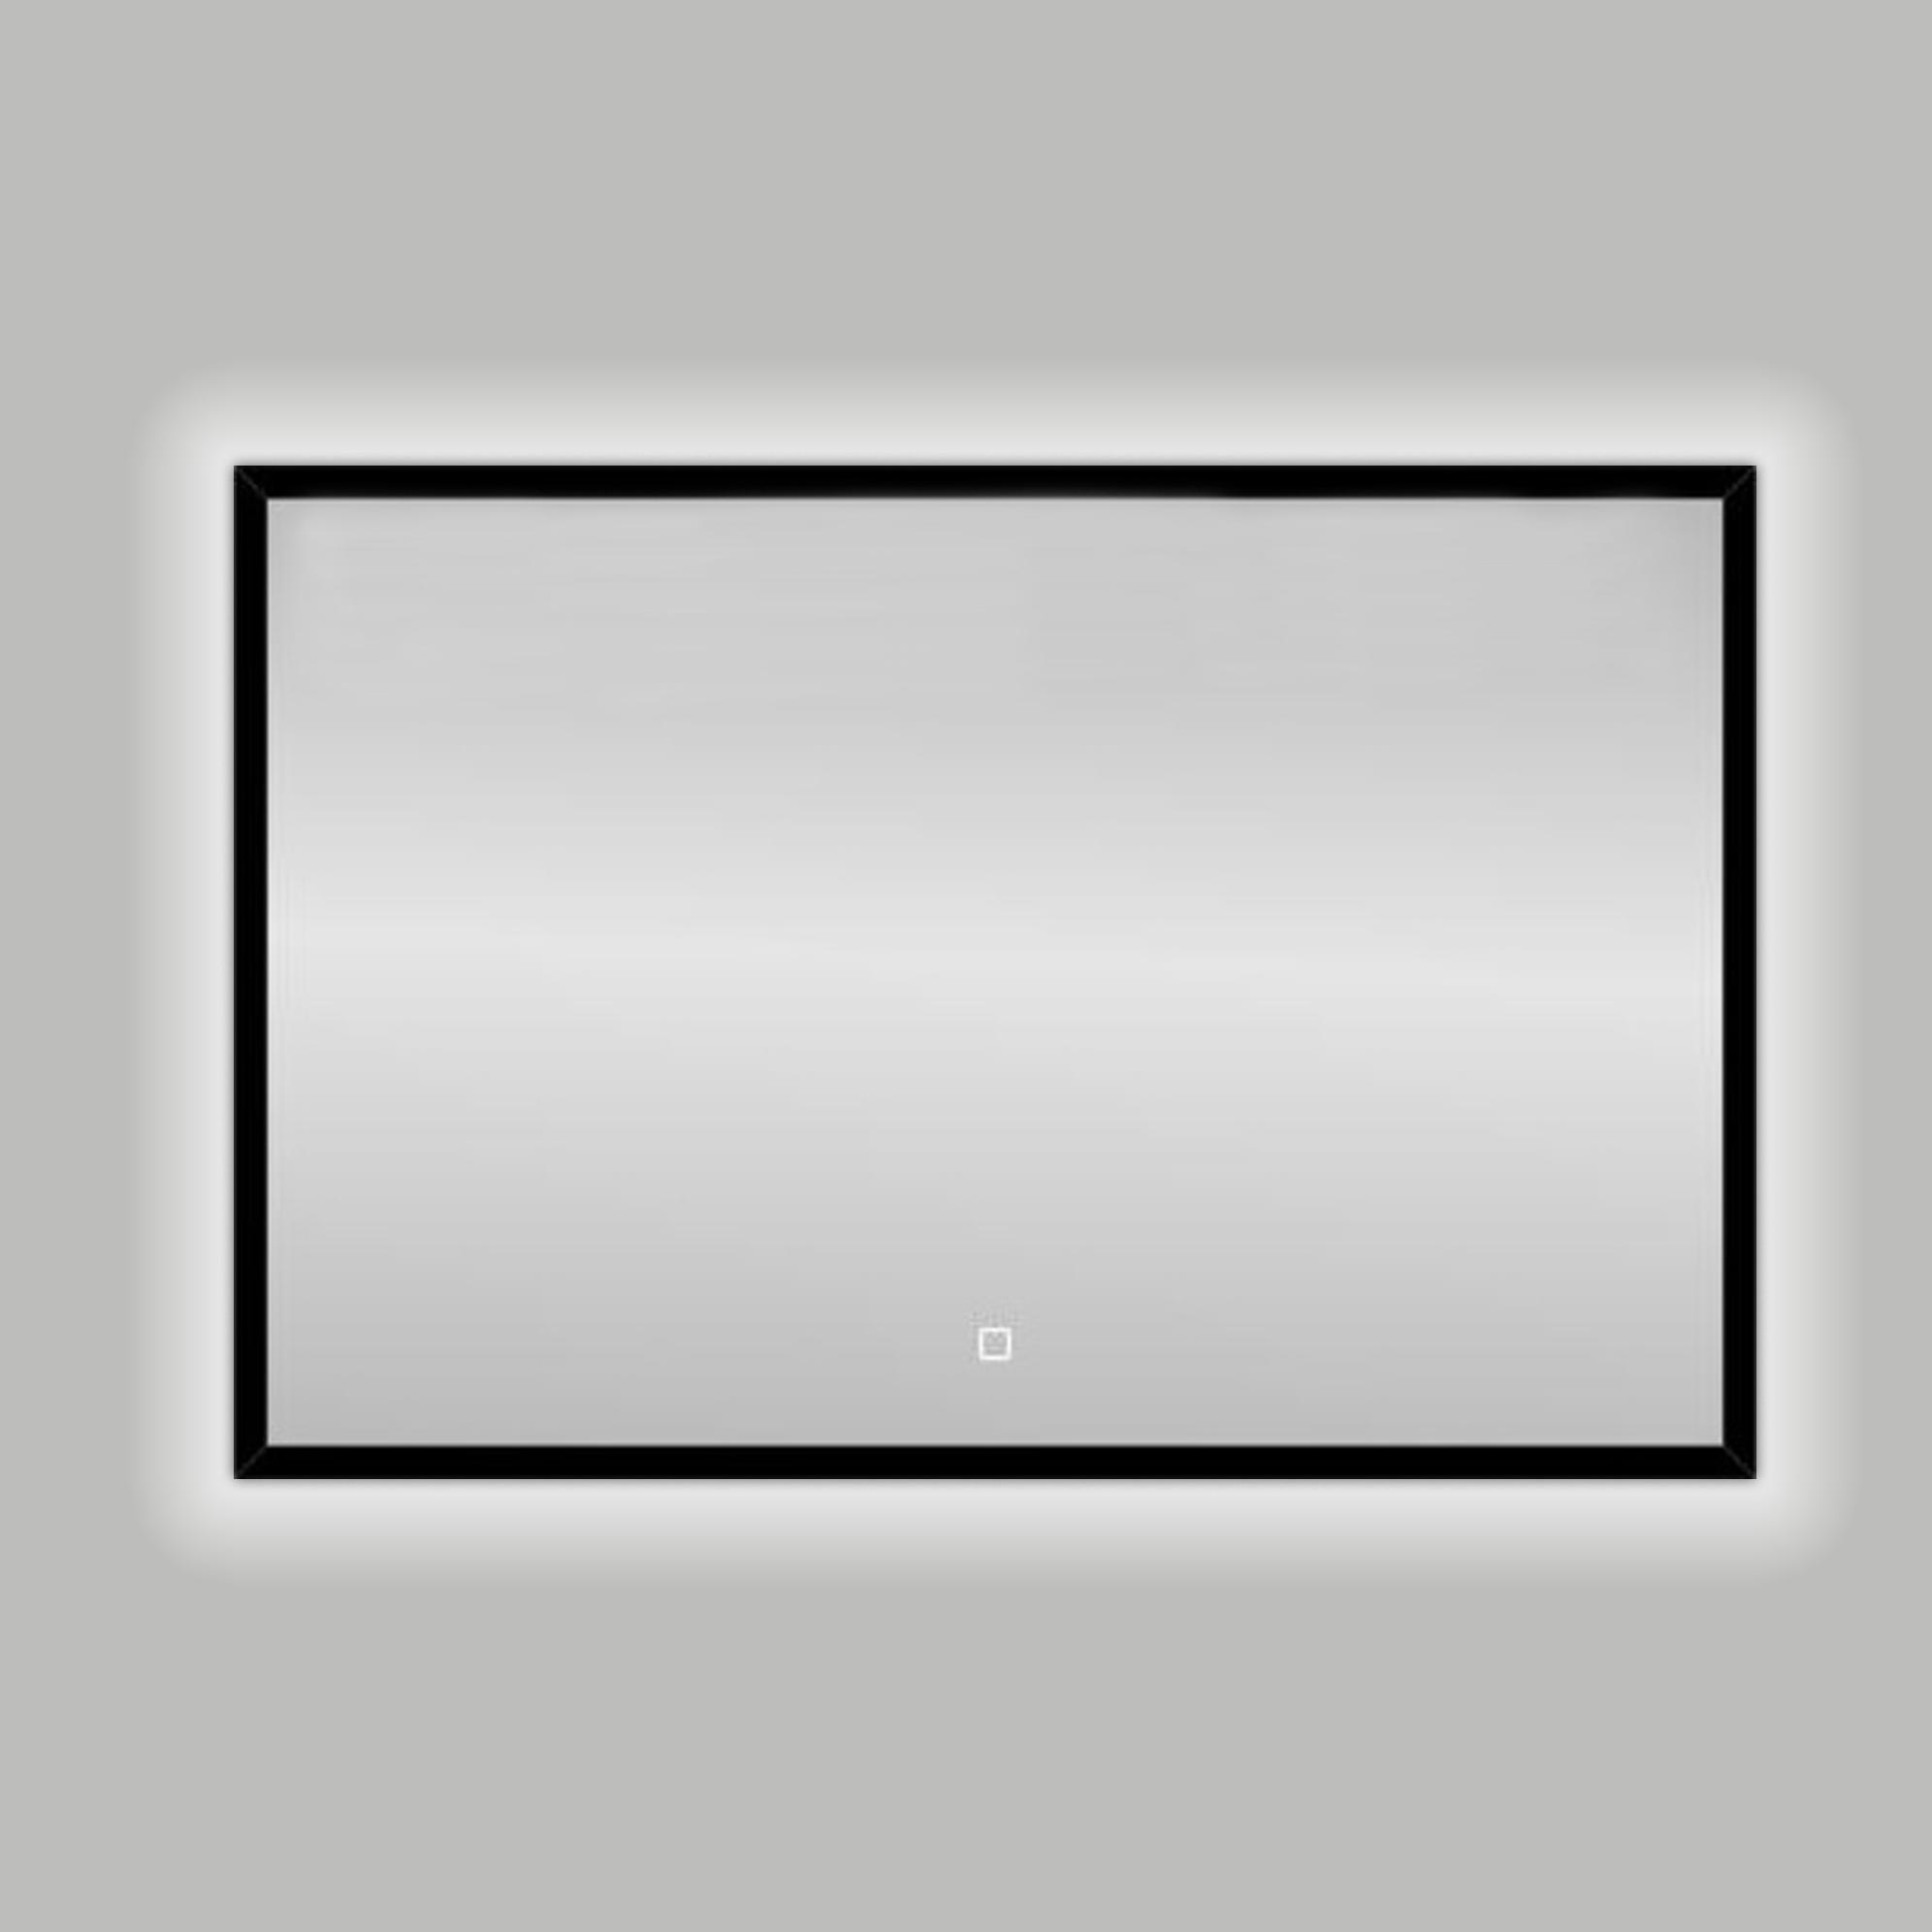 SHOWMODEL: Best Design Nero Solaro spiegel met LED en touchbediening 100x80cm